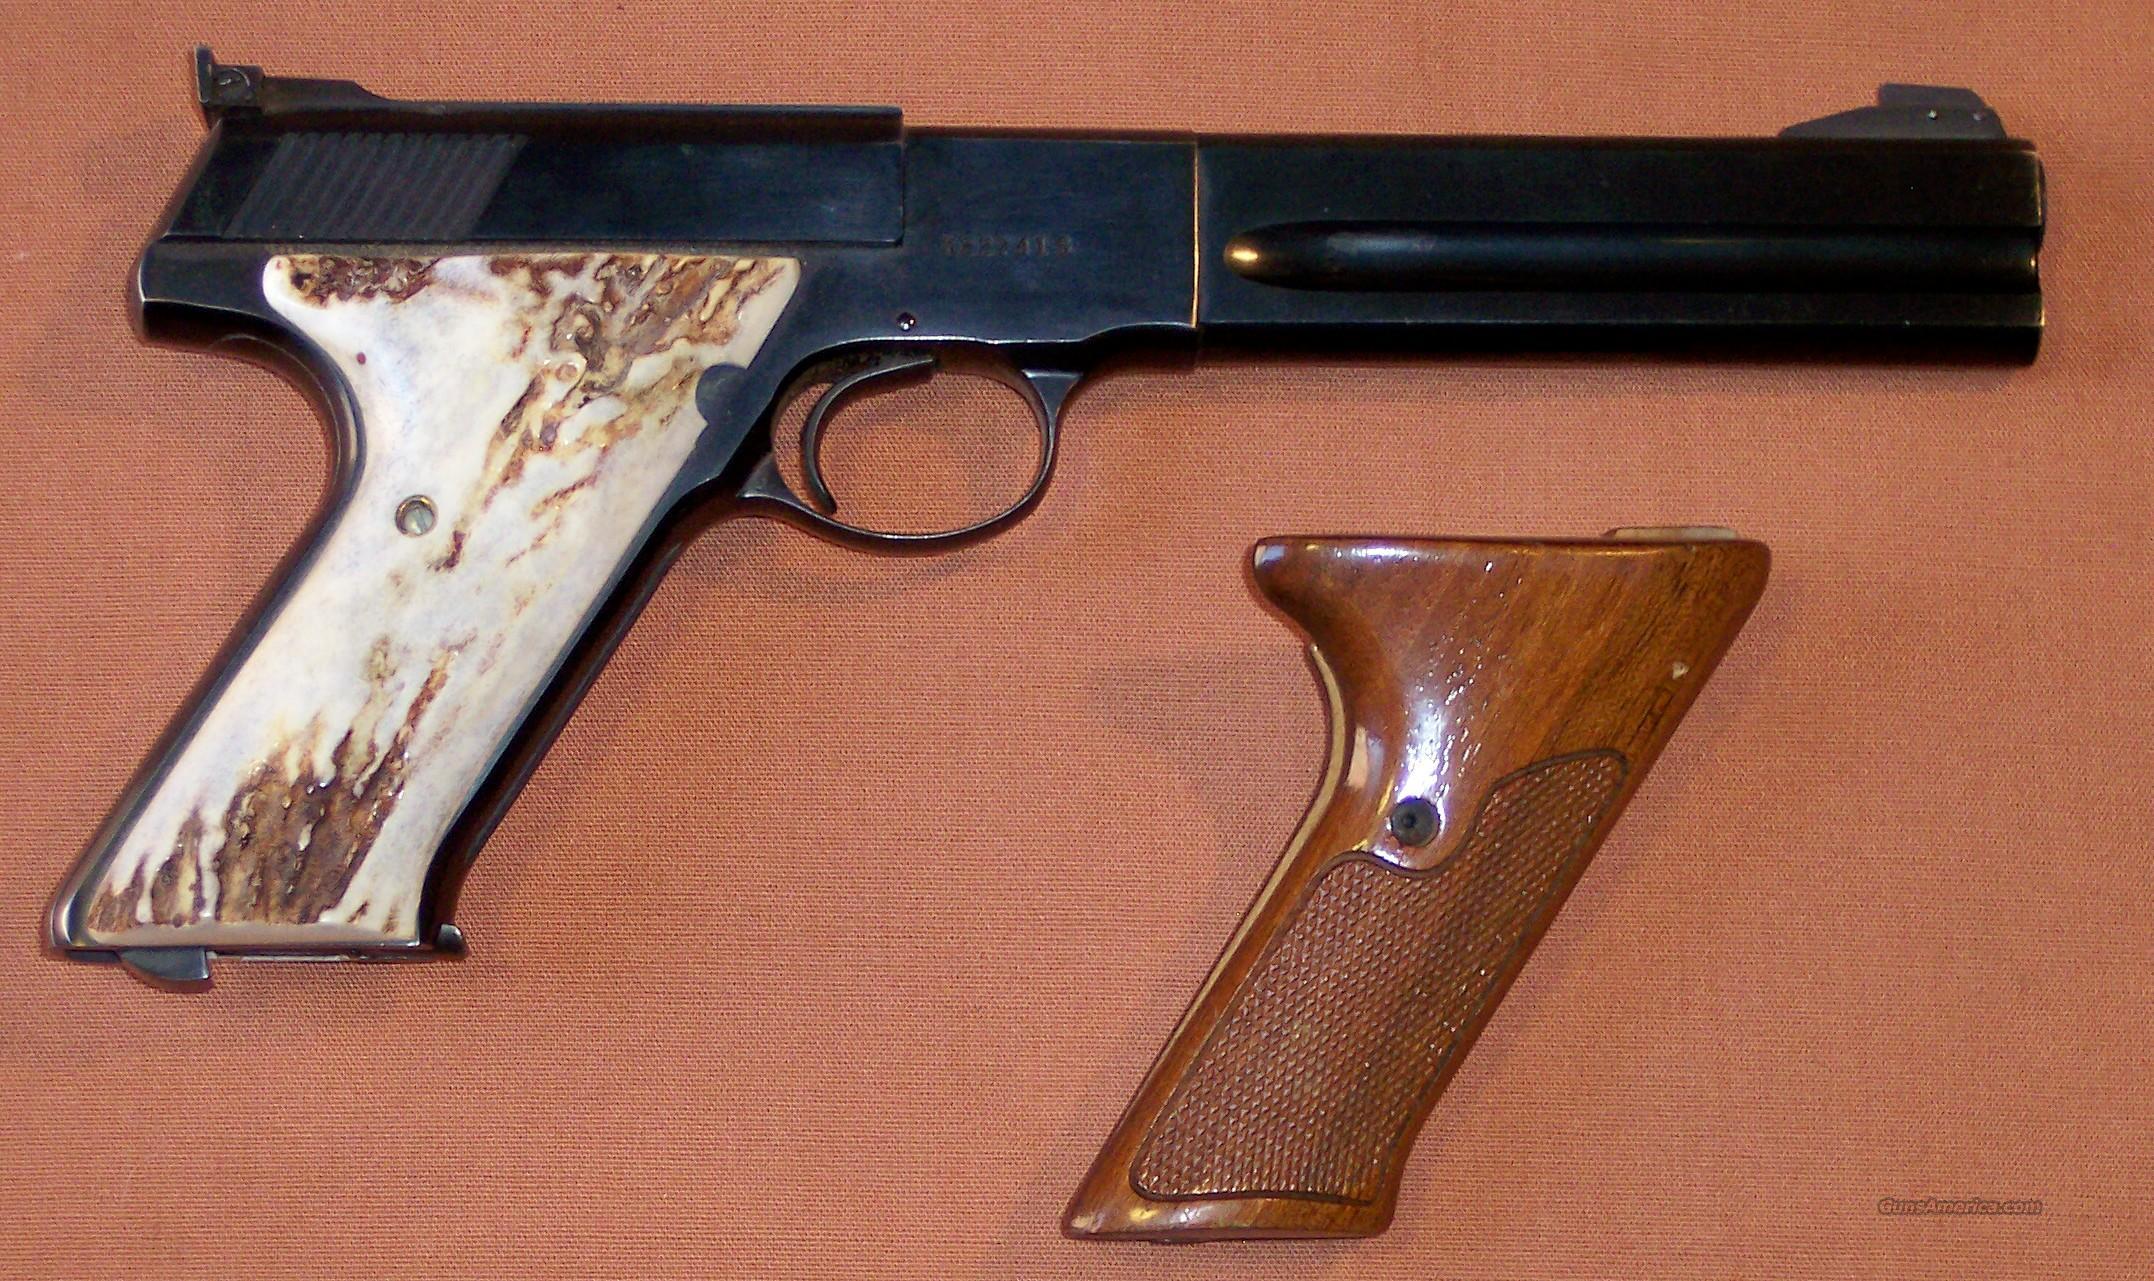 Colt Woodsman 3rd Series Match Target Model  Guns > Pistols > Colt Automatic Pistols (22 Cal.)